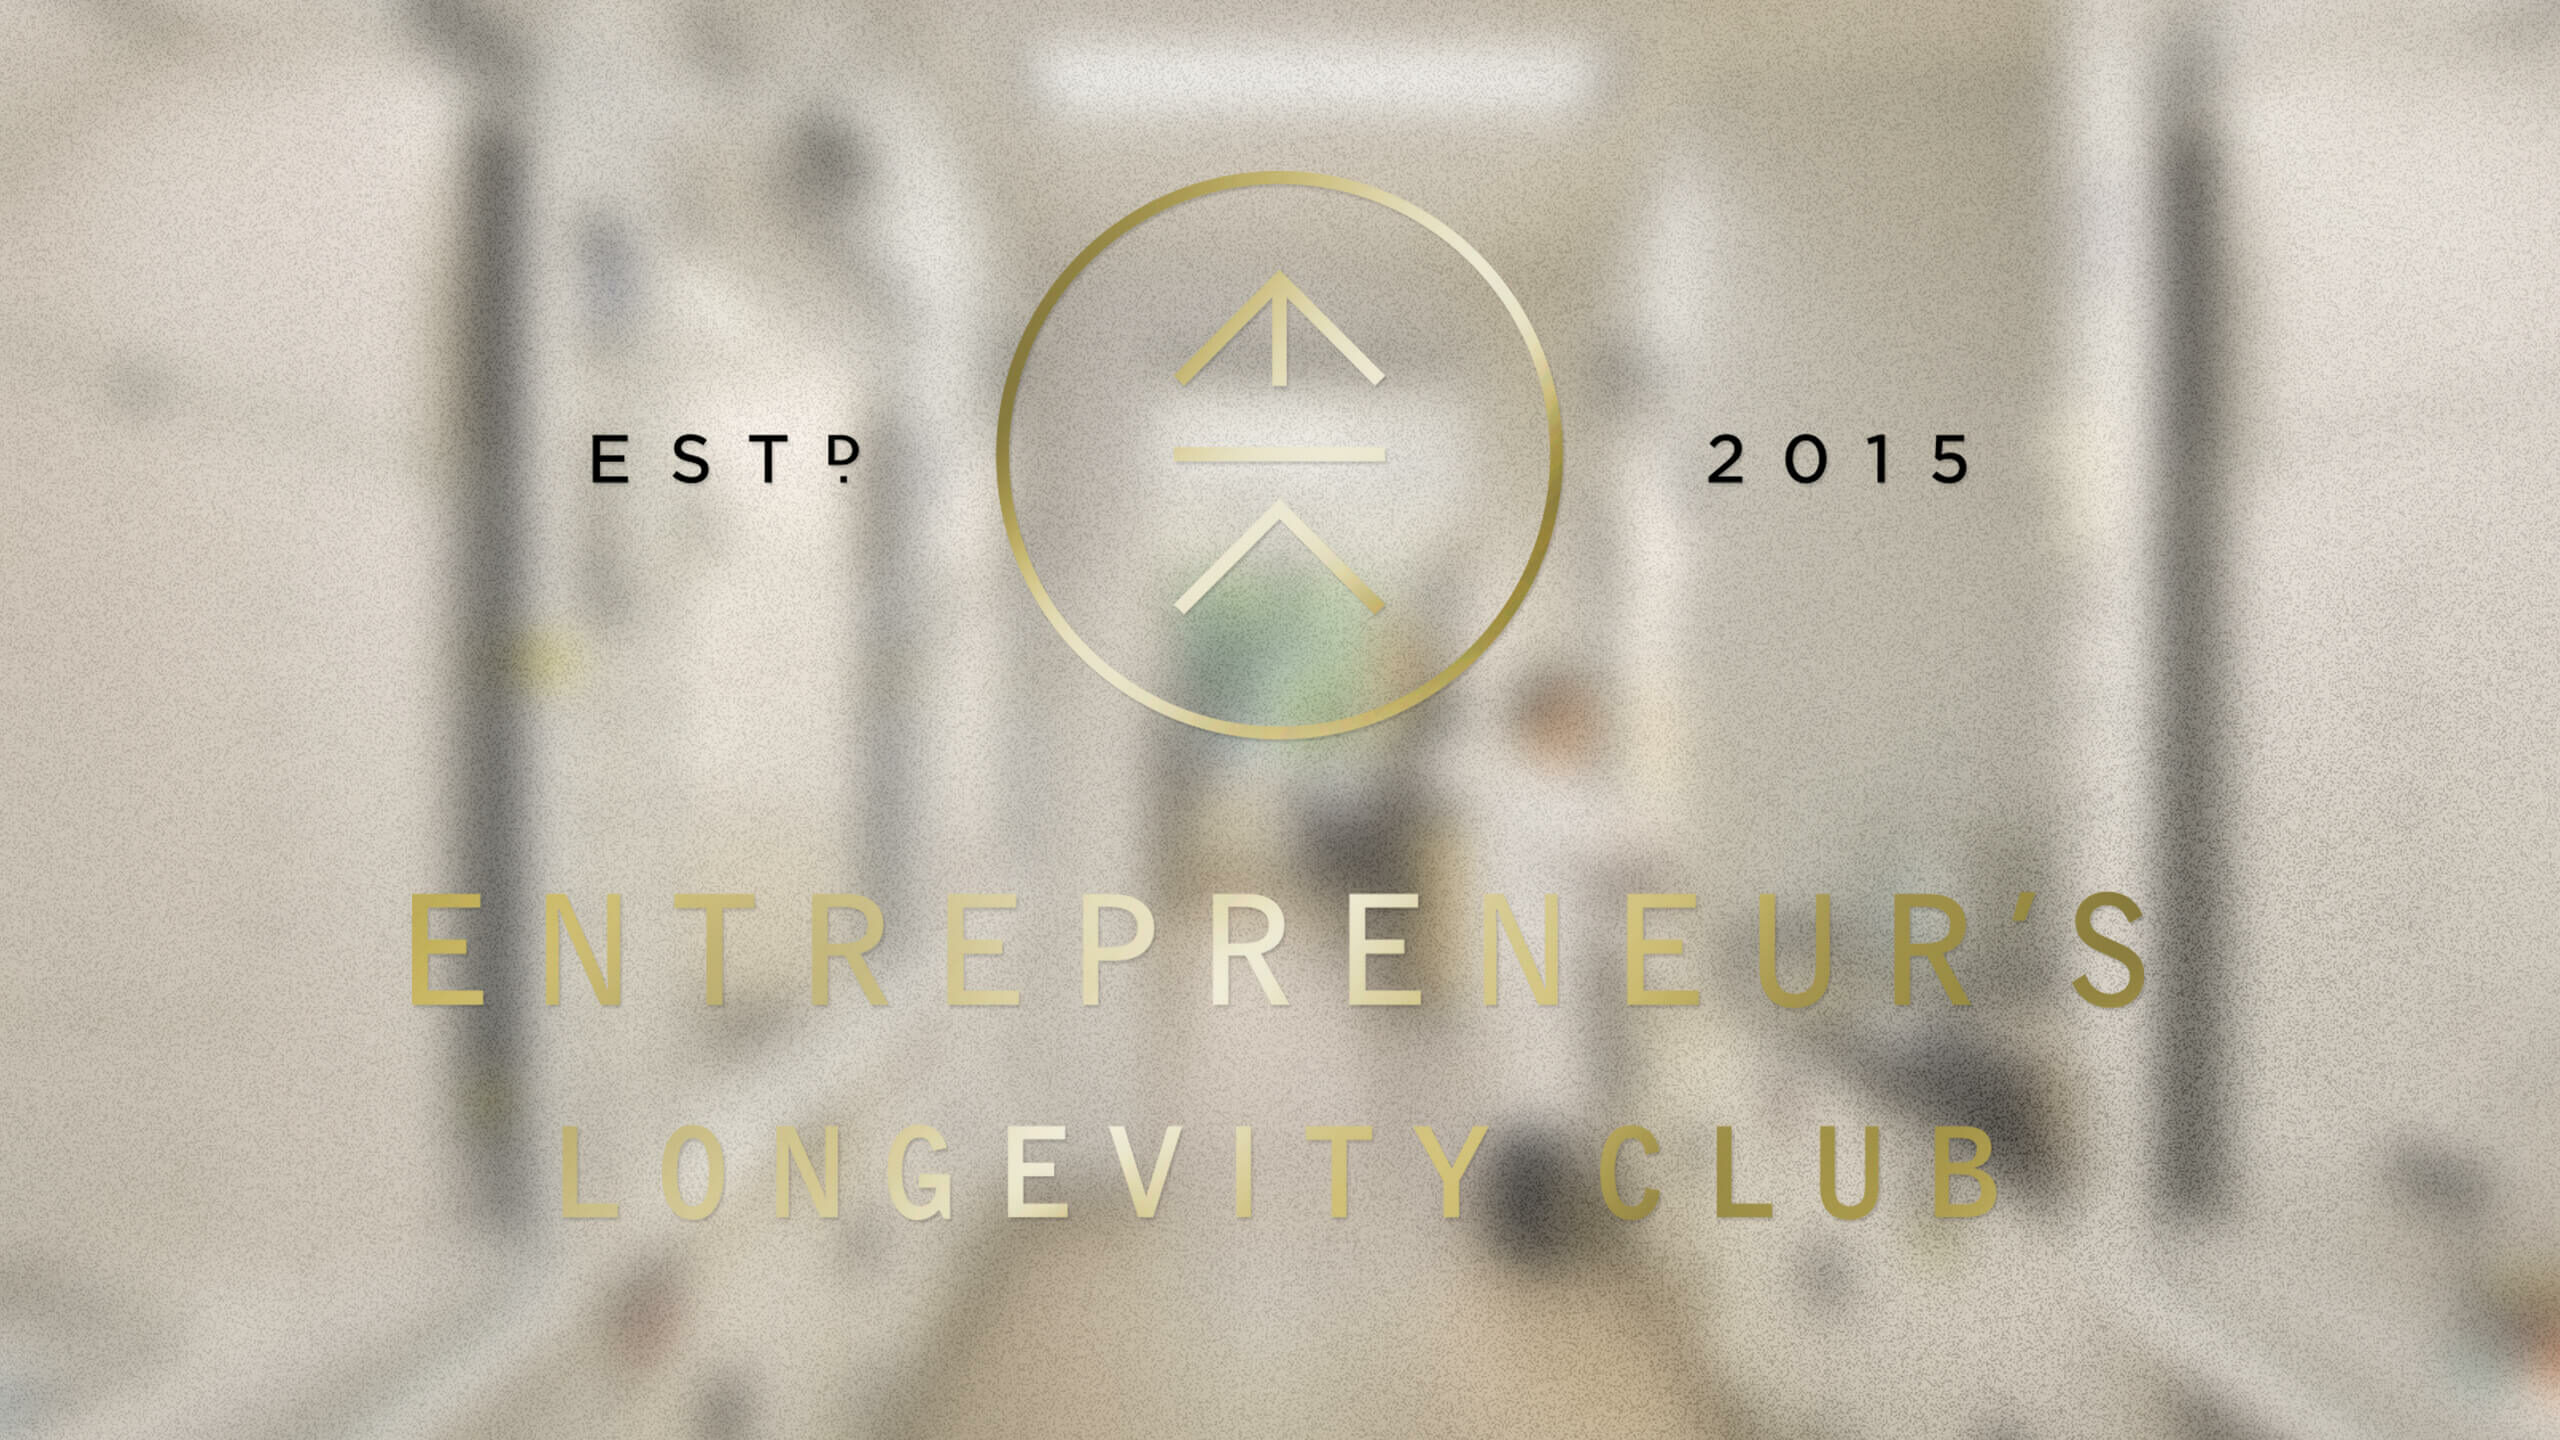 Sprout studios, Boston, industrial design, product design, start up, elc, branding, logo design, visual identity